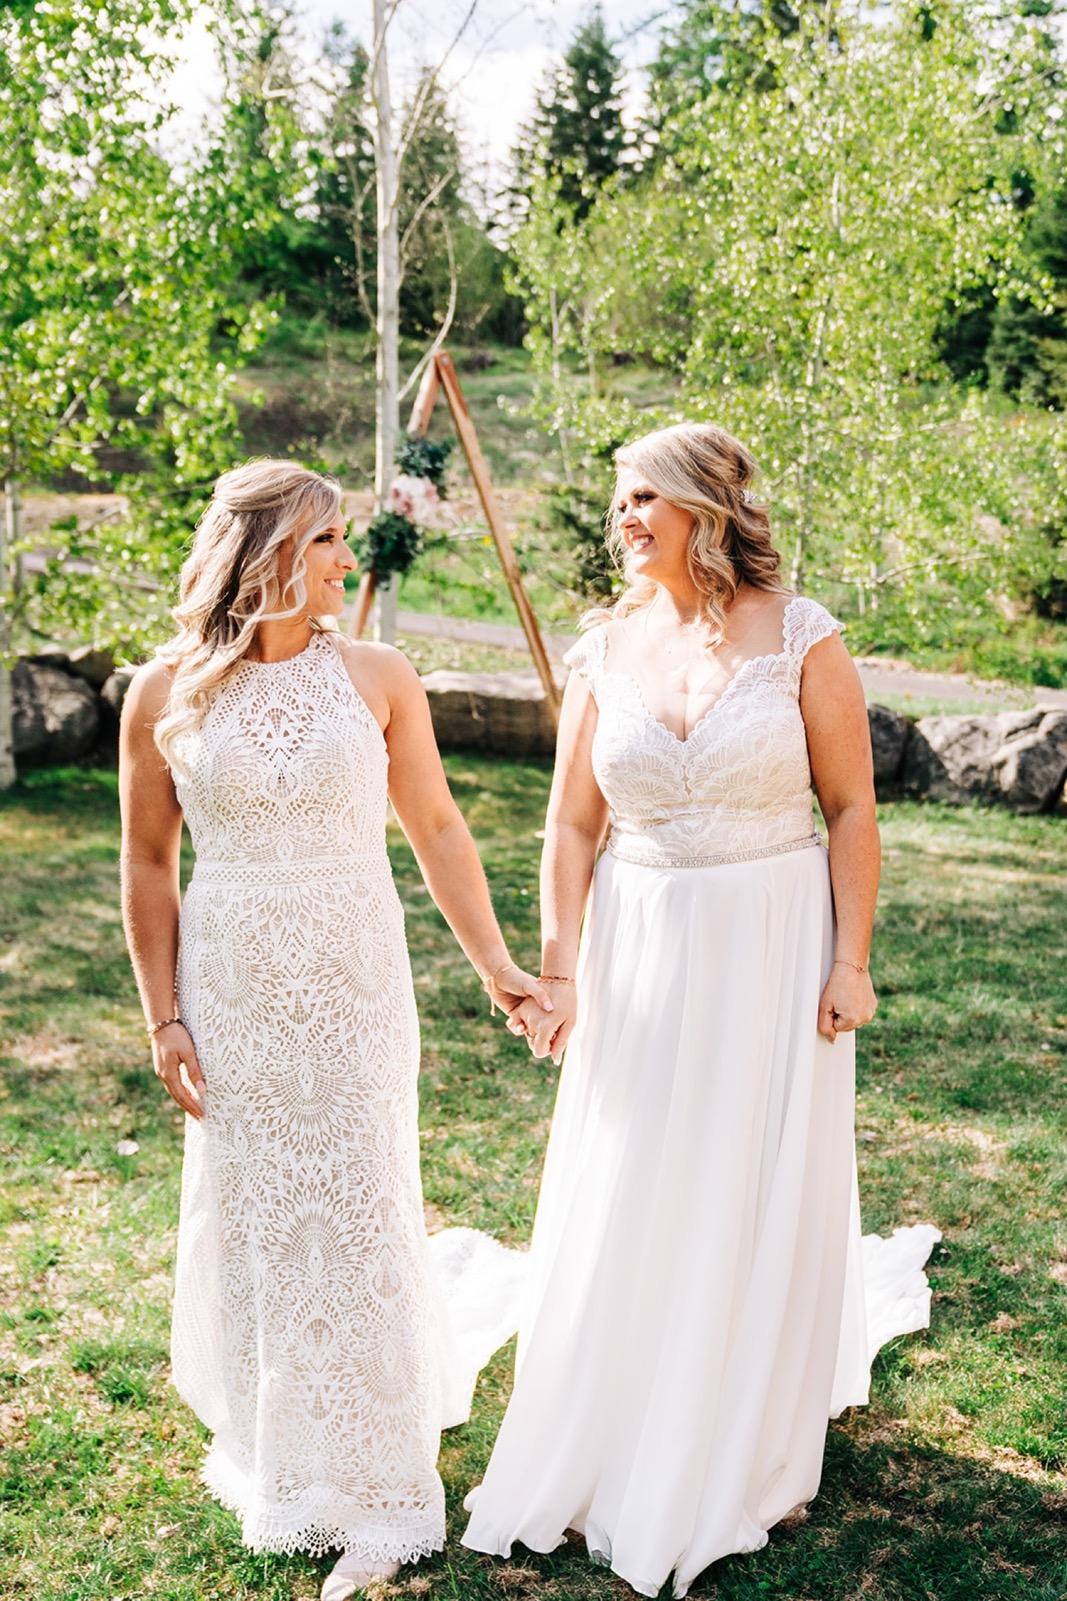 162_falissa_heather_wedding-339.jpg